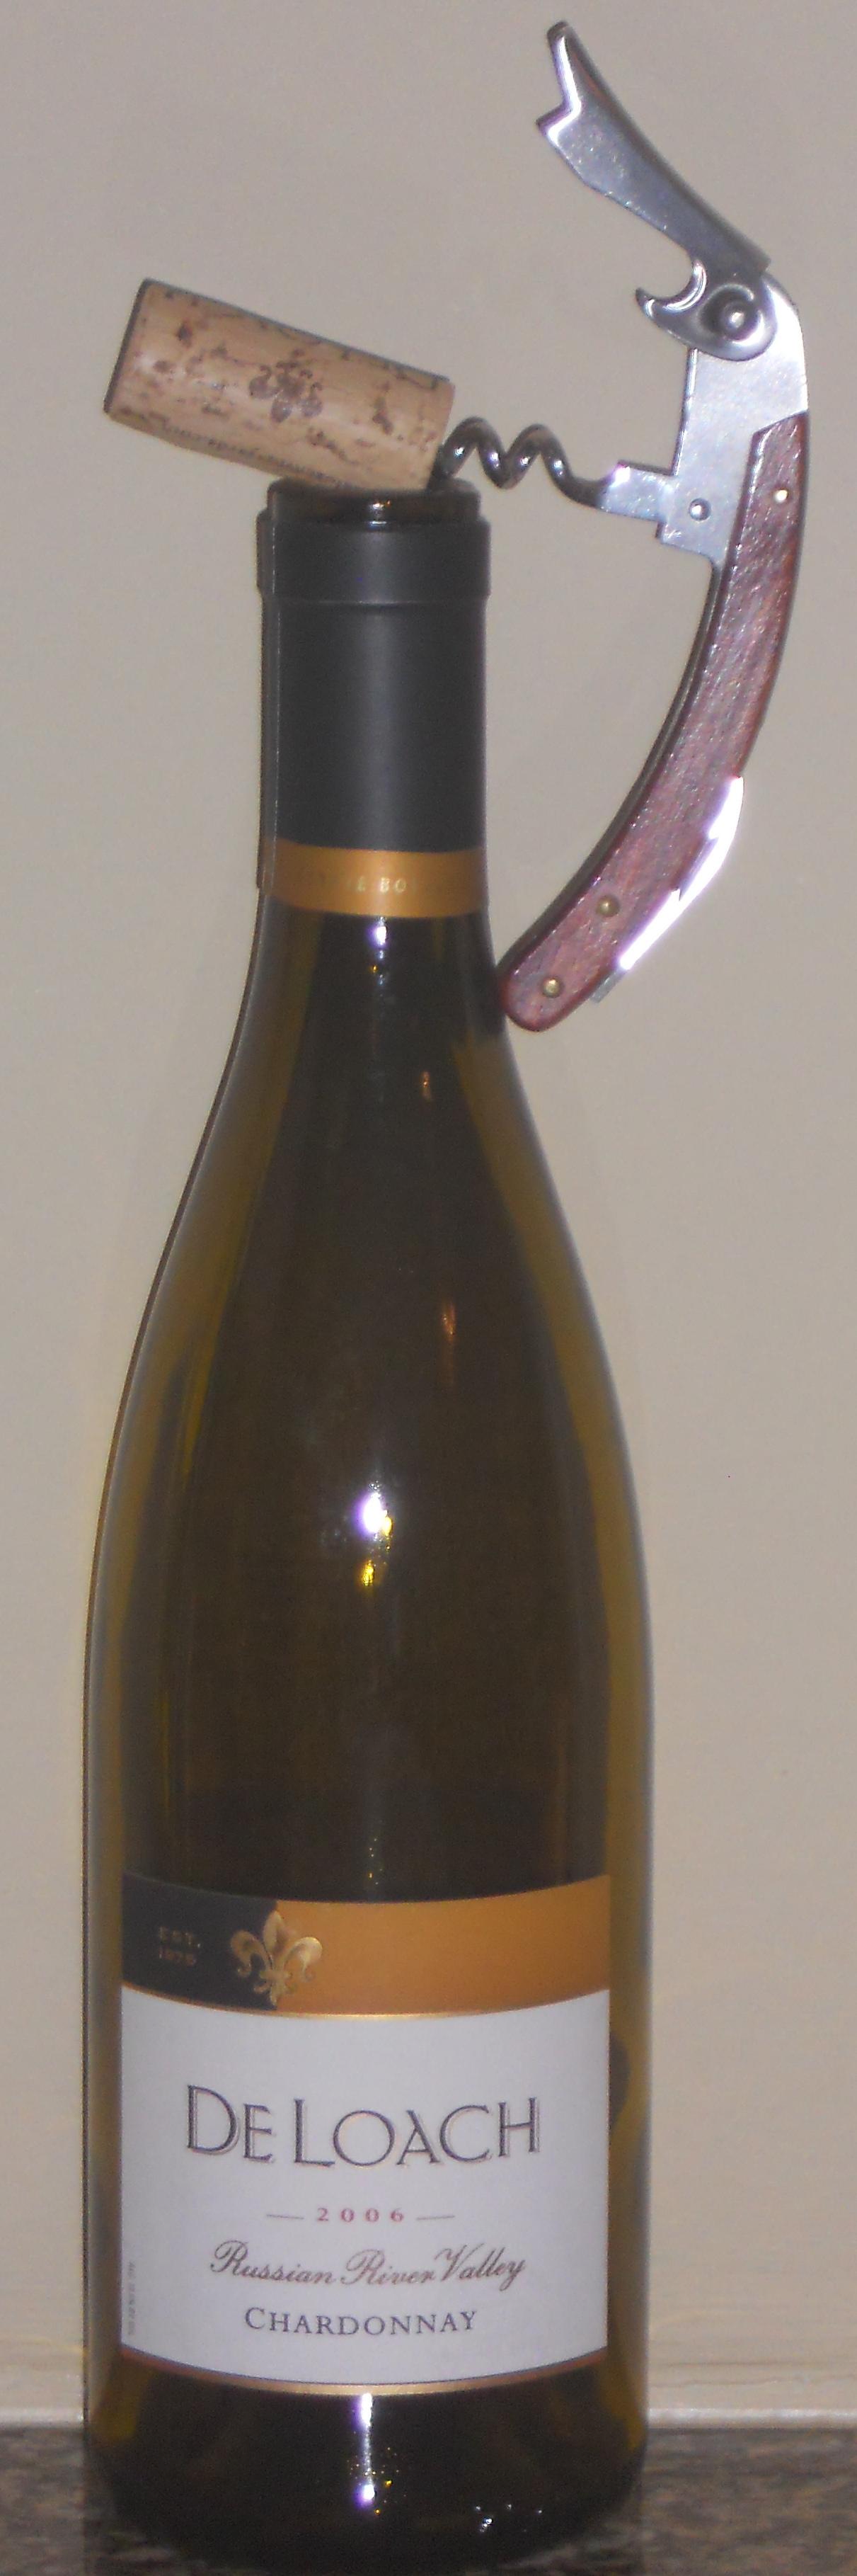 2006 De Loach Chardonnay, Porter-Bass Vineyards, Sonoma County, CA